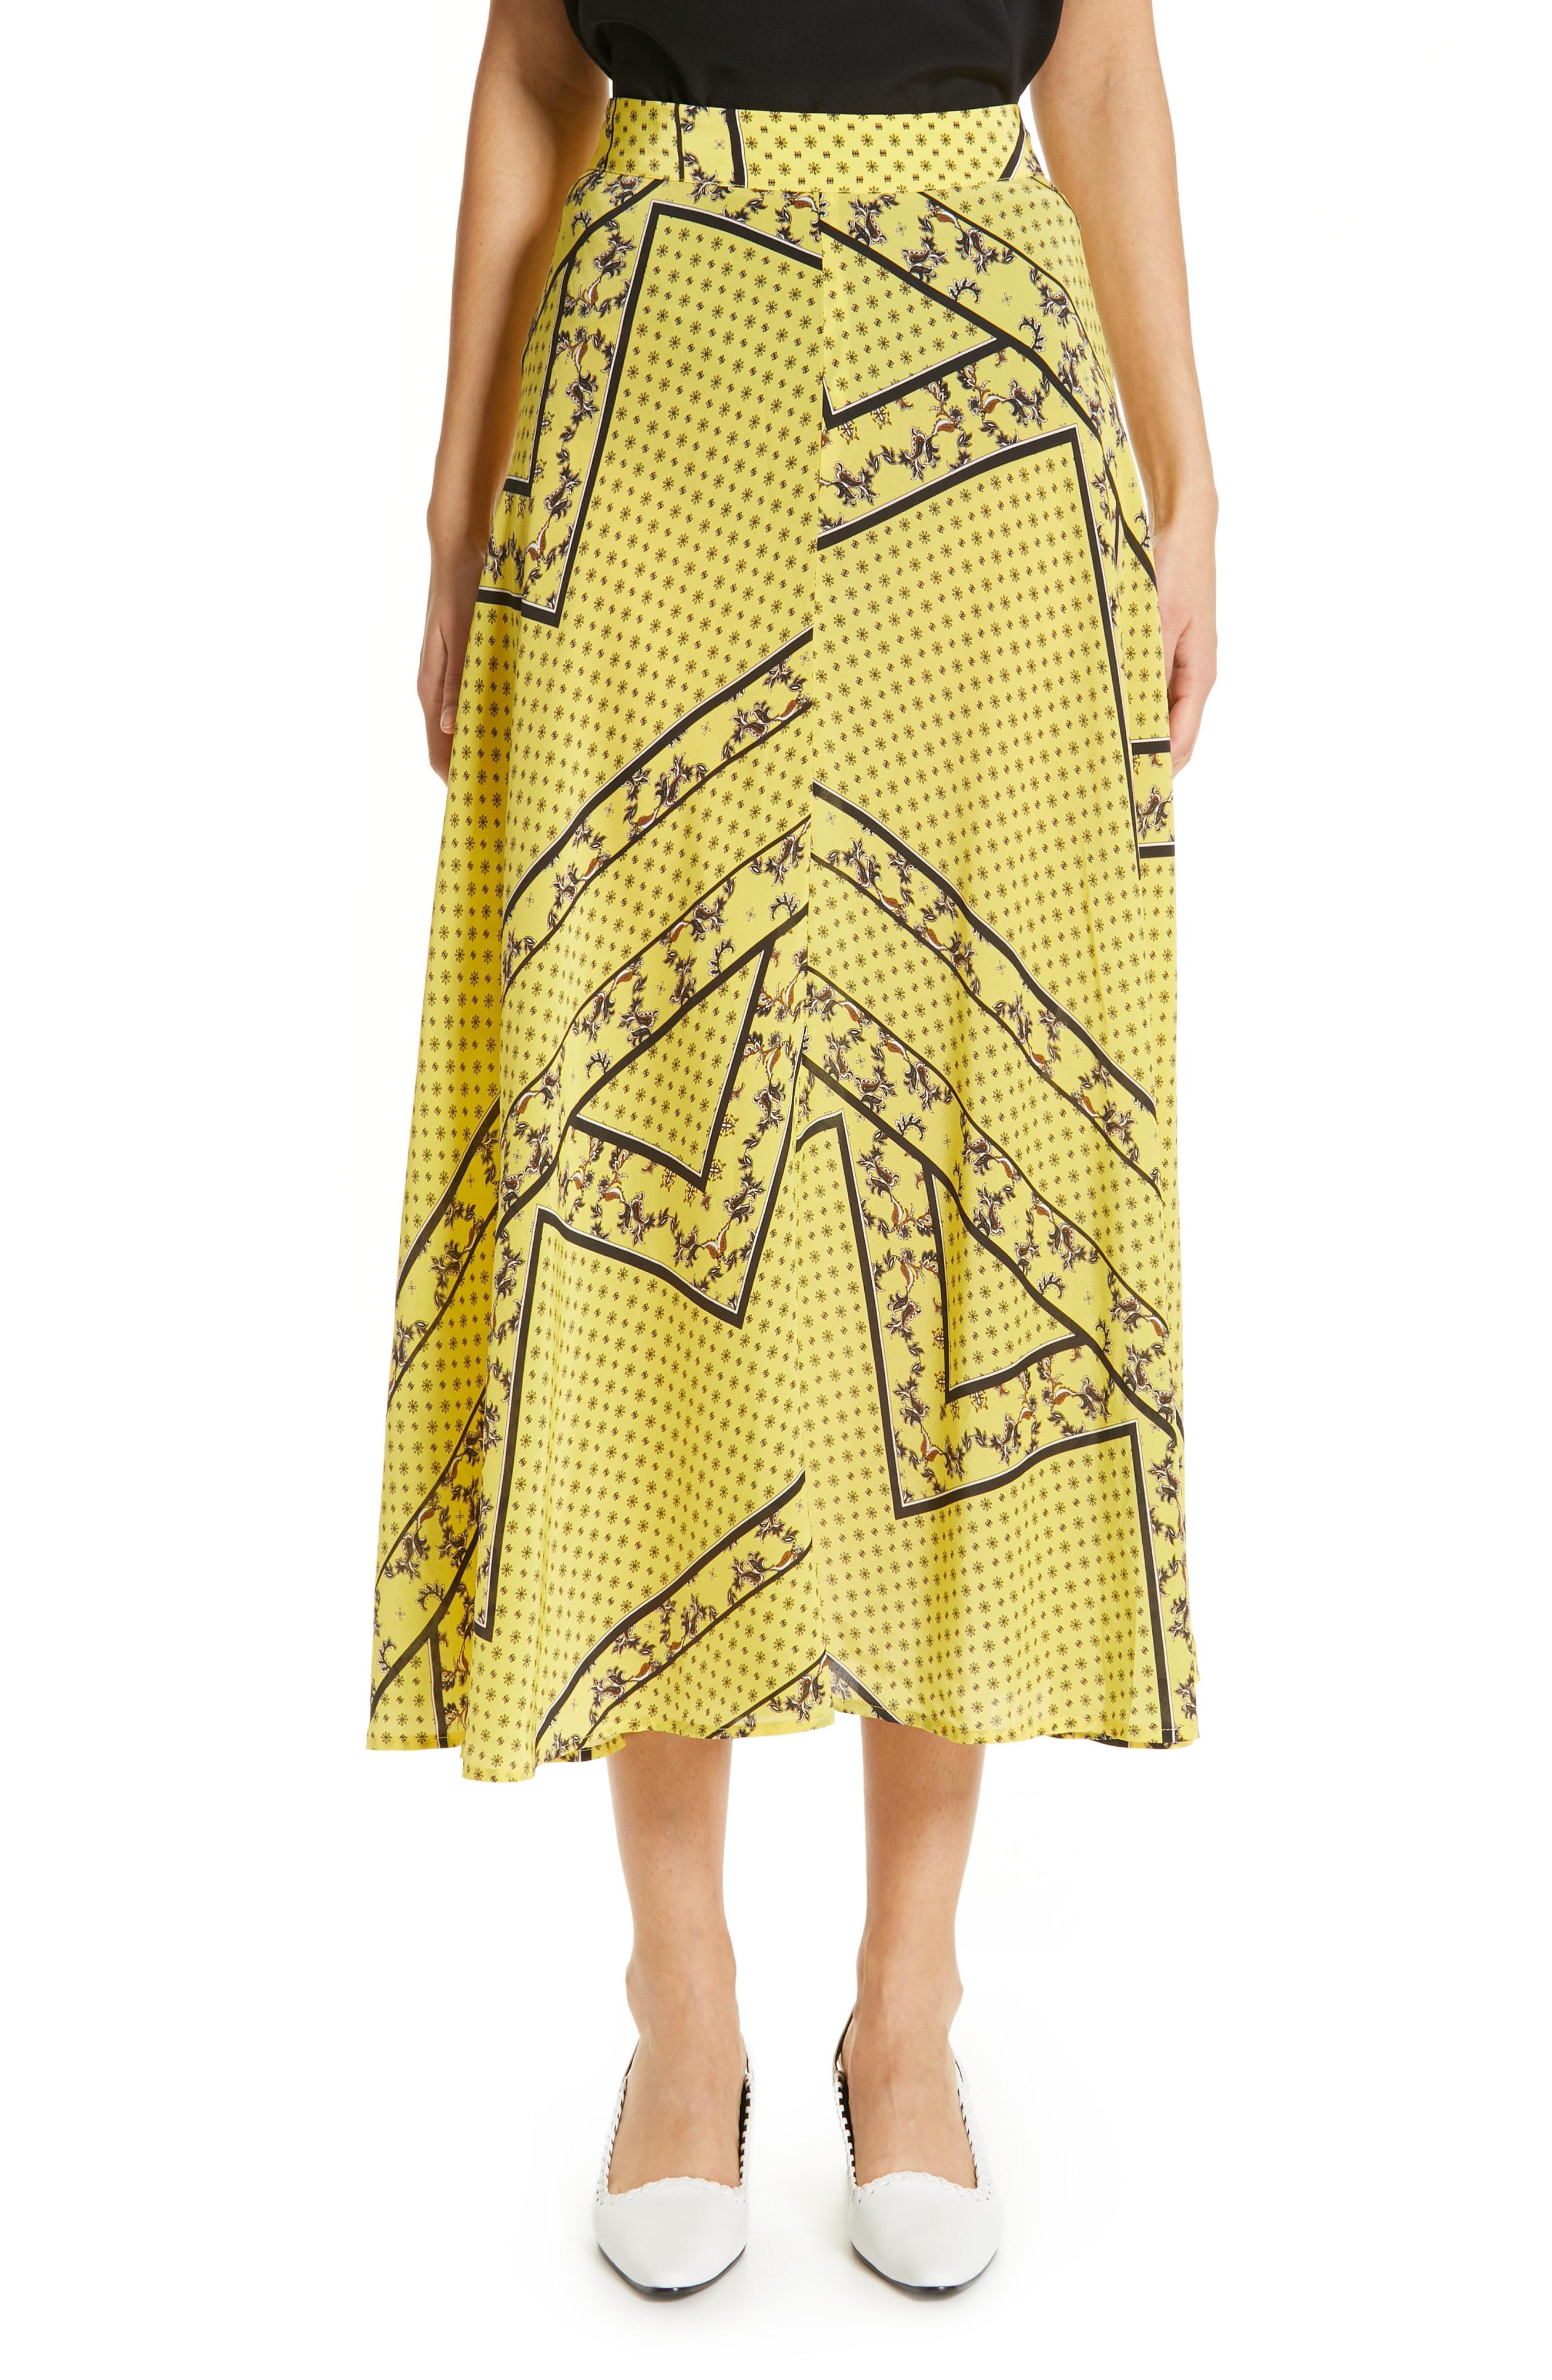 8d5836525 Ganni Paisley & Floral Print A-Line Midi Skirt In Yellow | ModeSens